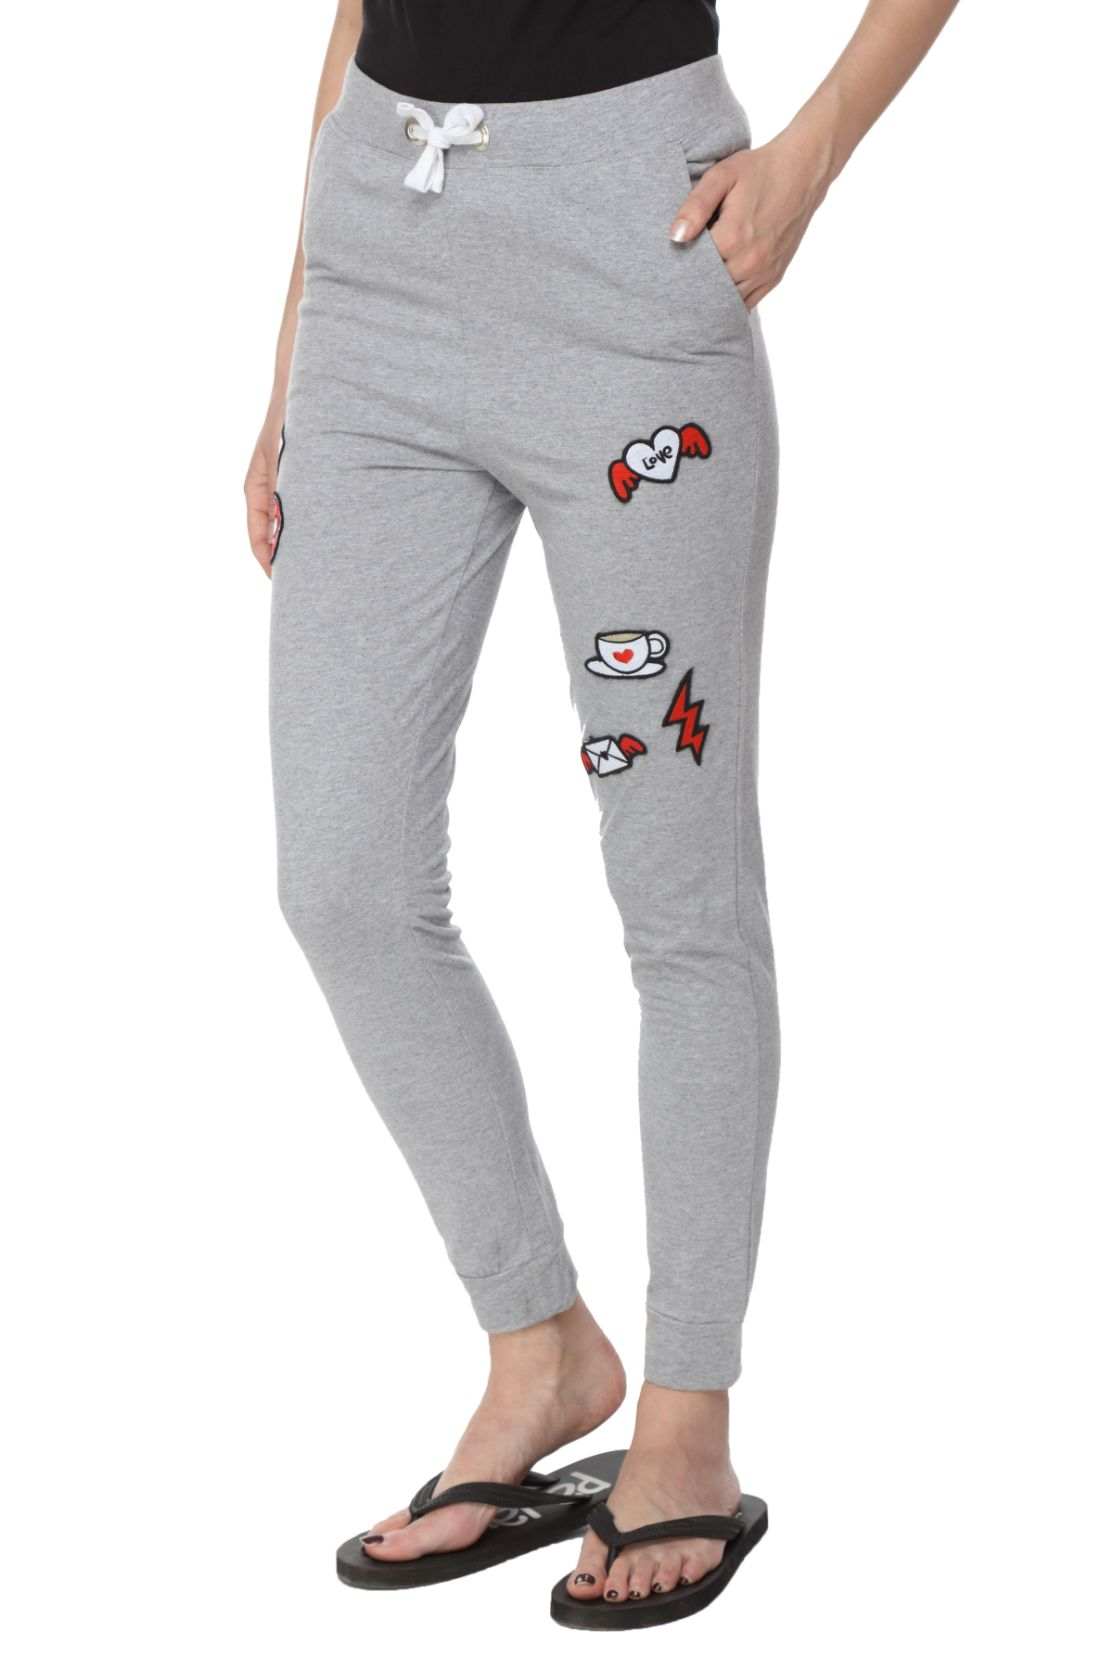 Slumber Jill Women Pyjama (Pack of 1)